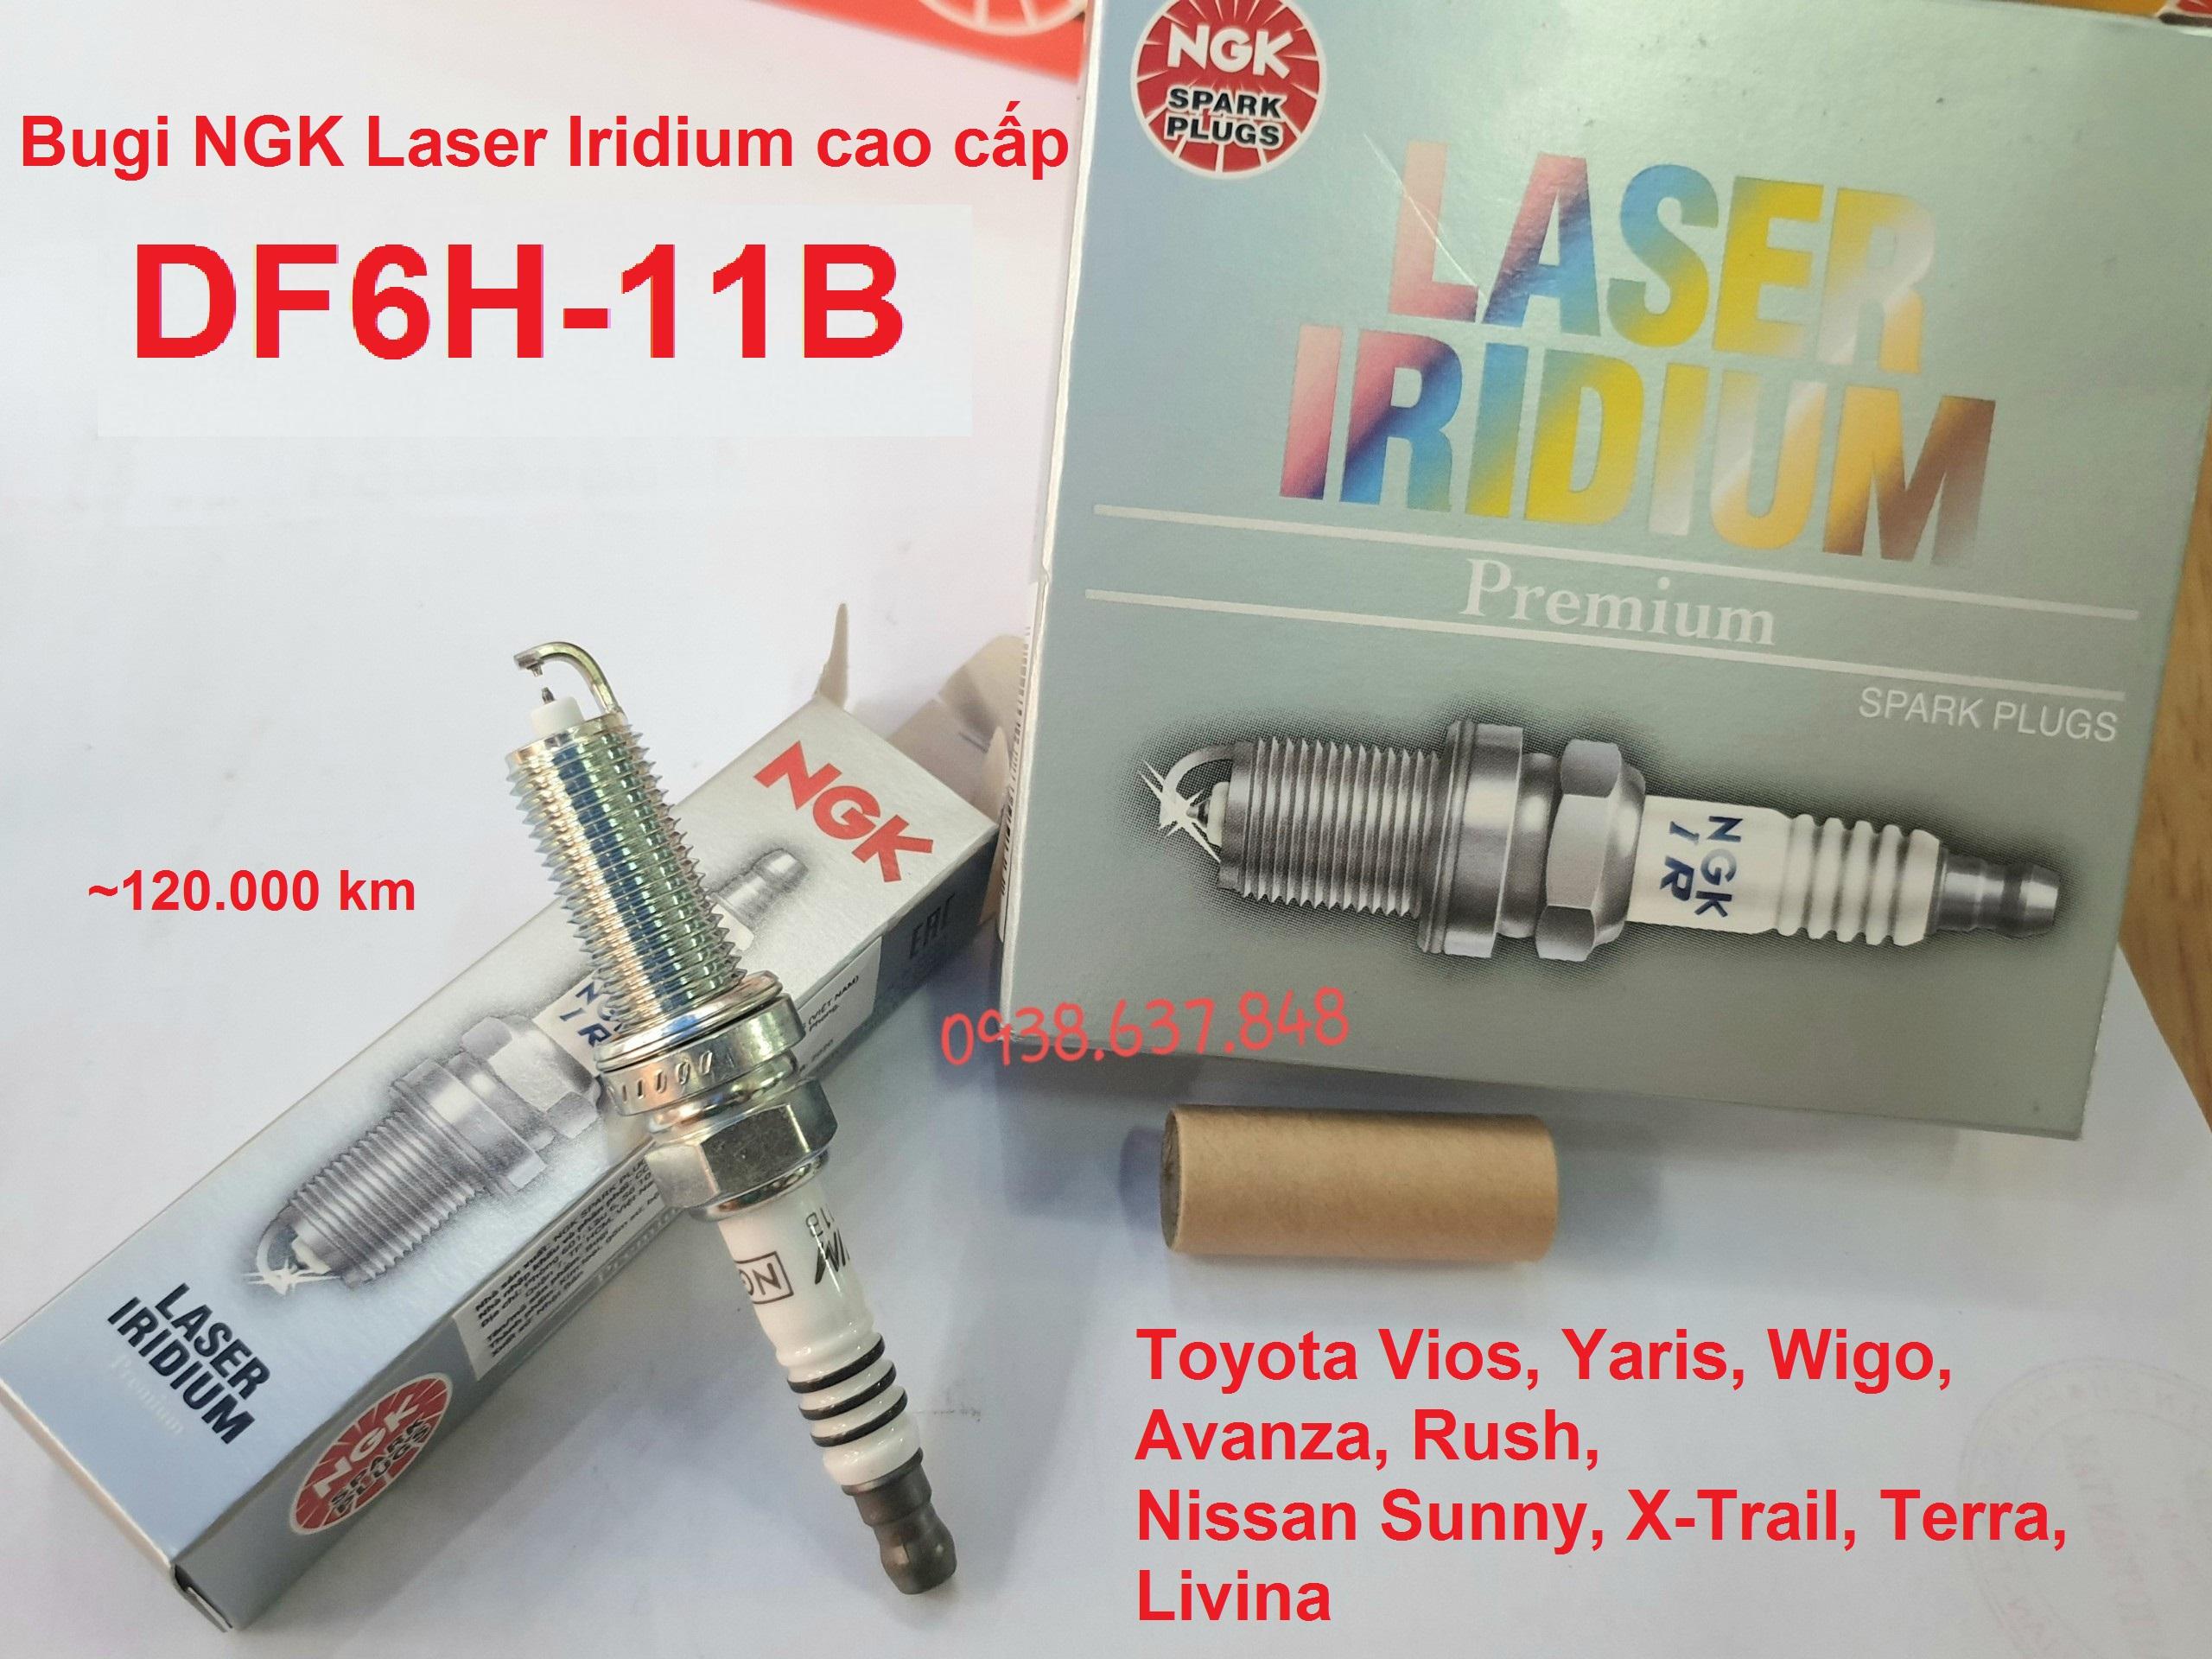 (mã DF6H-11B) Bugi NGK Laser Iridium dùng Toyota Vios Yaris Wigo Avanza Rush Nissan Sunny X-Trail Terra Livina